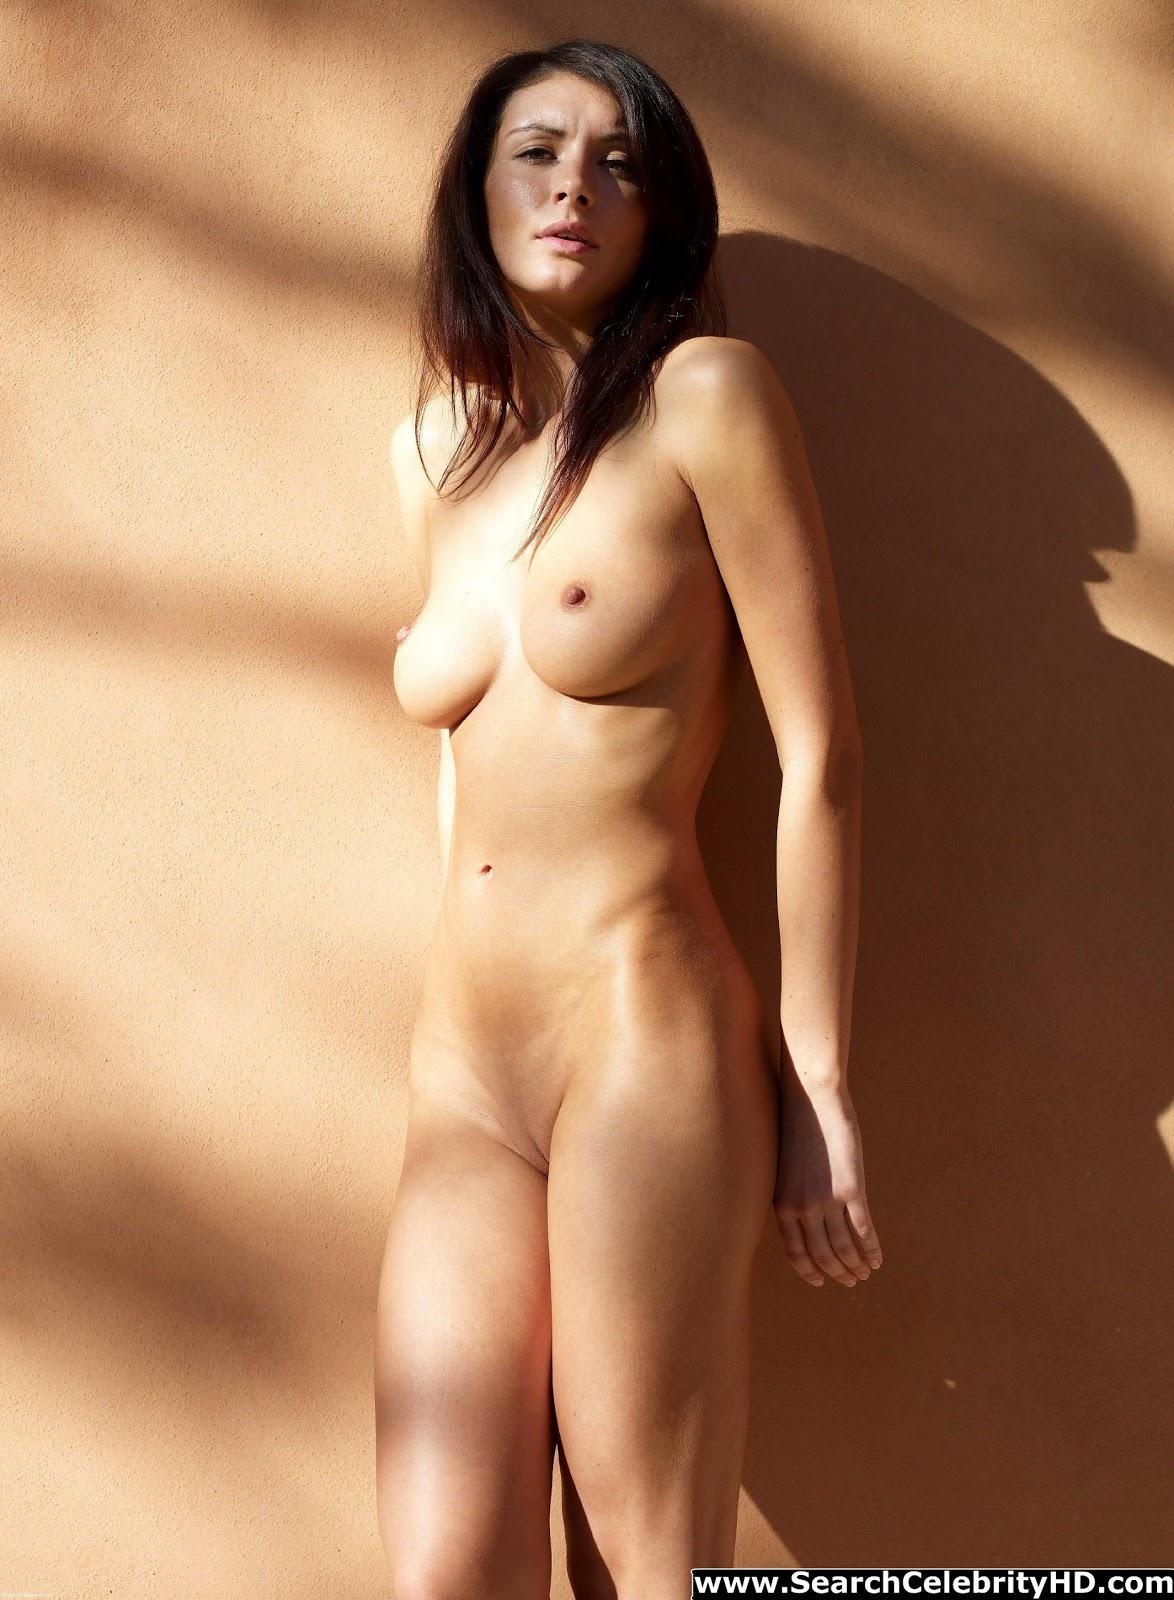 http://1.bp.blogspot.com/--3muDG9kaV4/UMyM-3u7ZUI/AAAAAAAABGo/9o04QPR97W8/s1600/Orsi+Kocsis+nude-www.searchcelebrityhd.com-001+(100).jpg